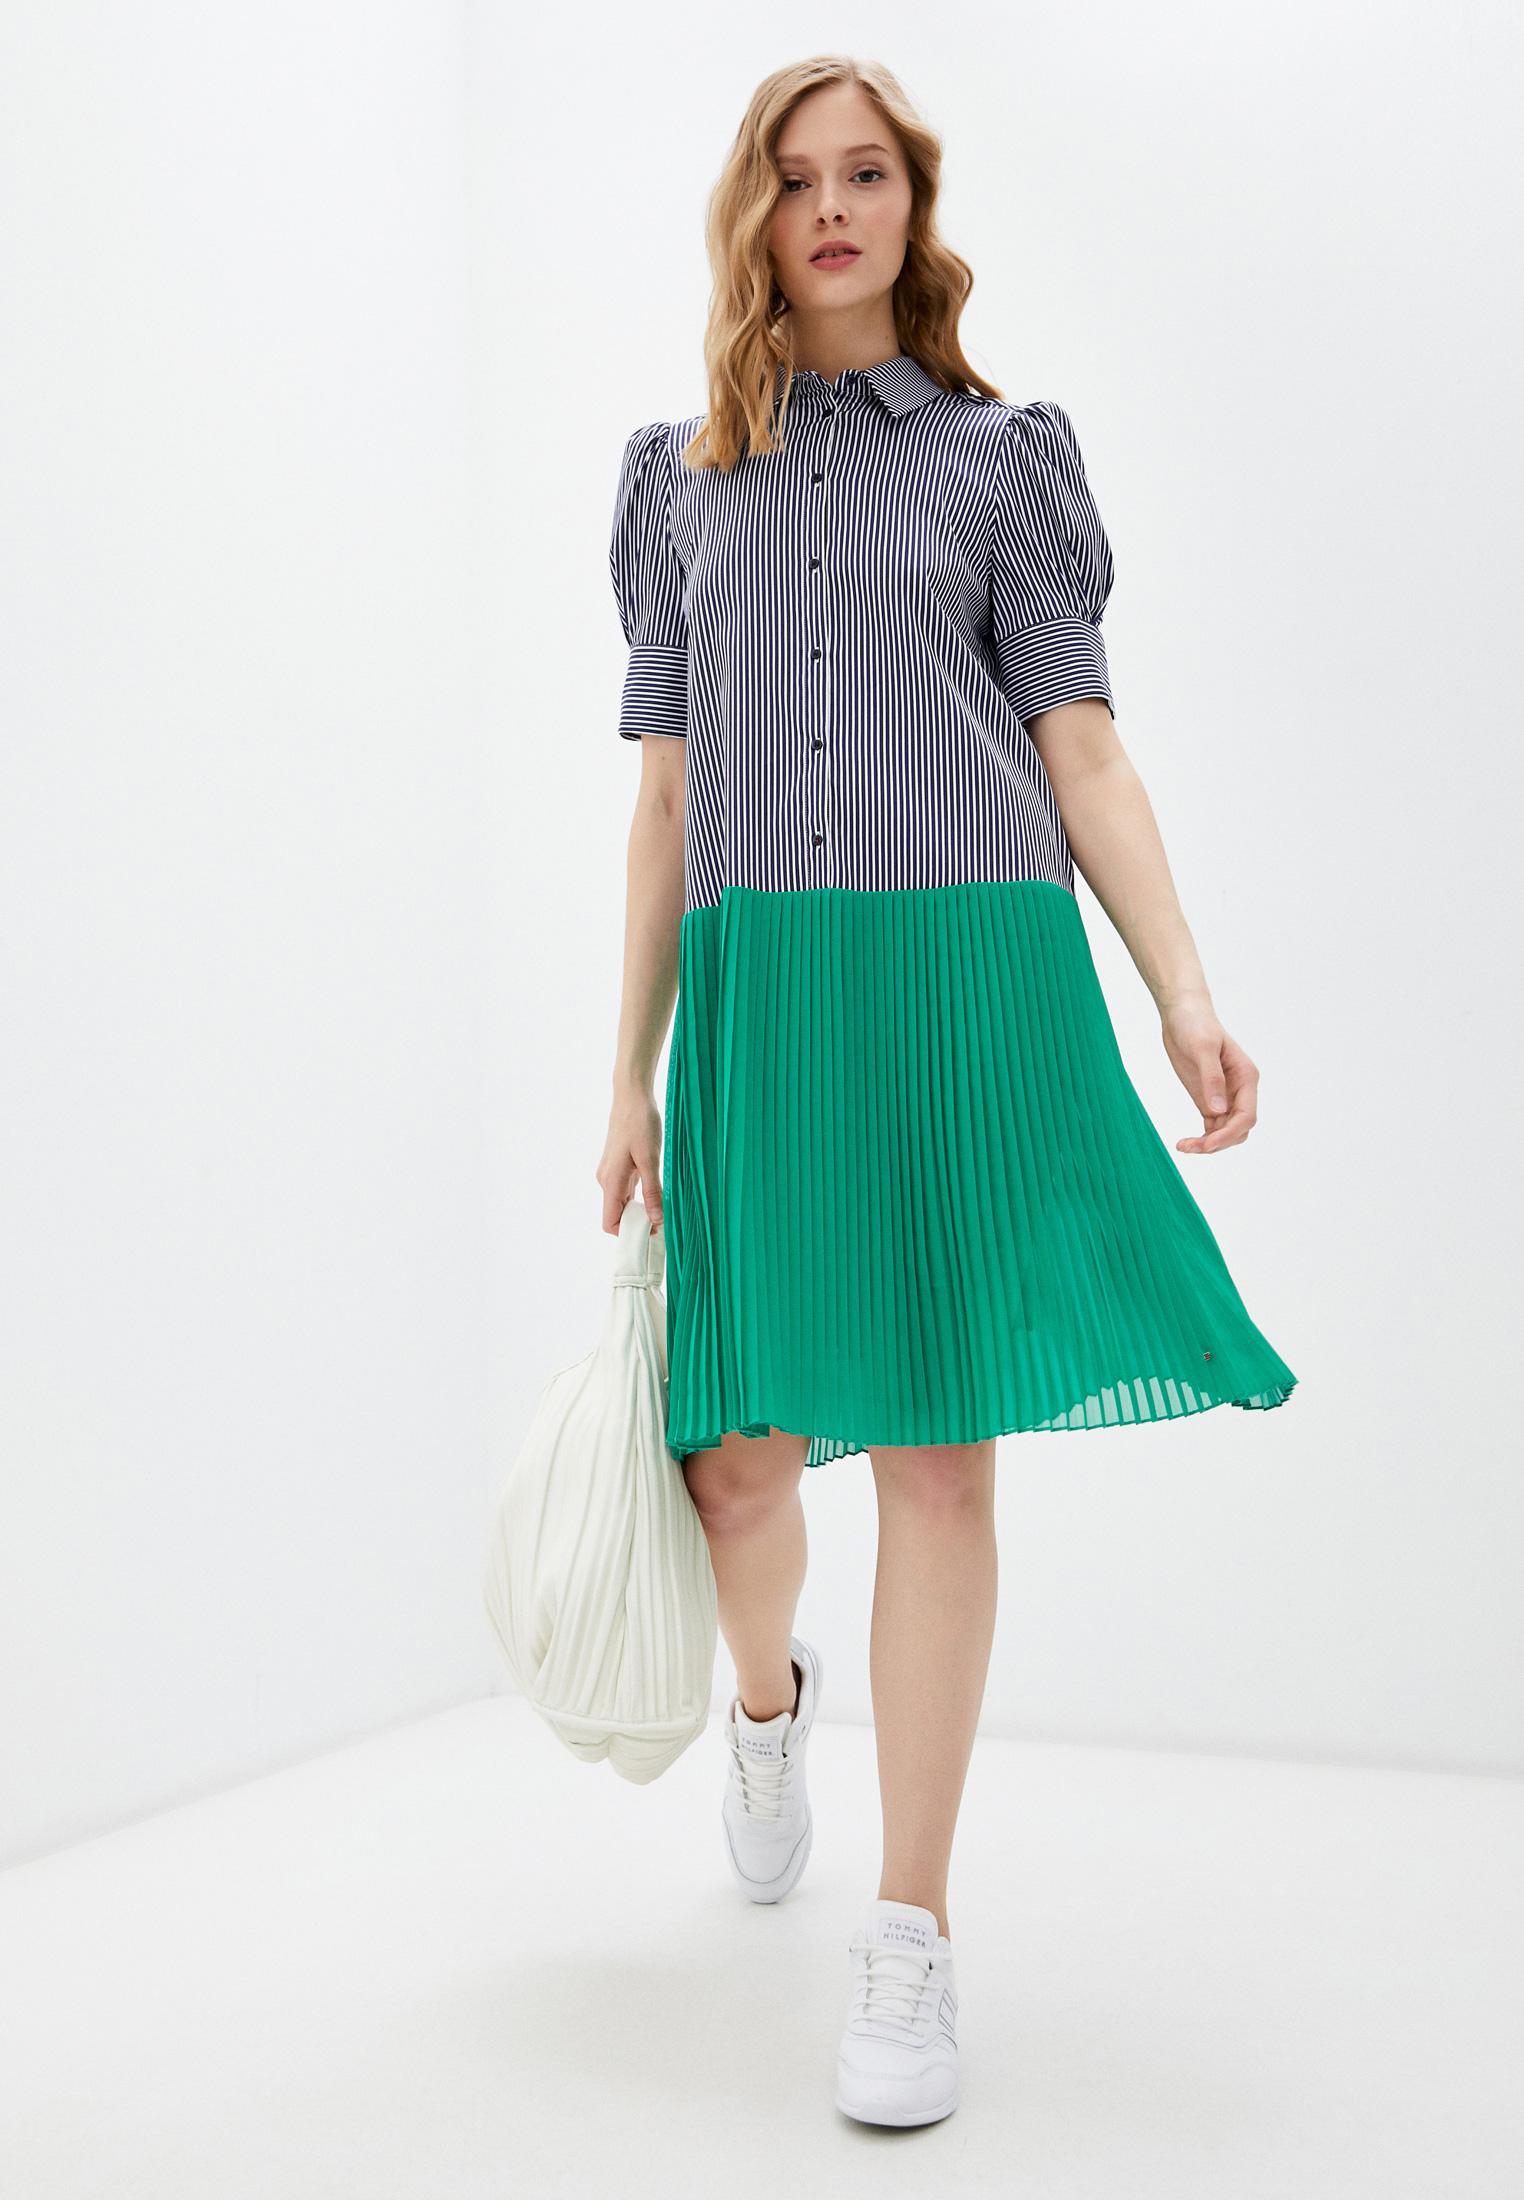 Платье Tommy Hilfiger (Томми Хилфигер) WW0WW30694: изображение 2